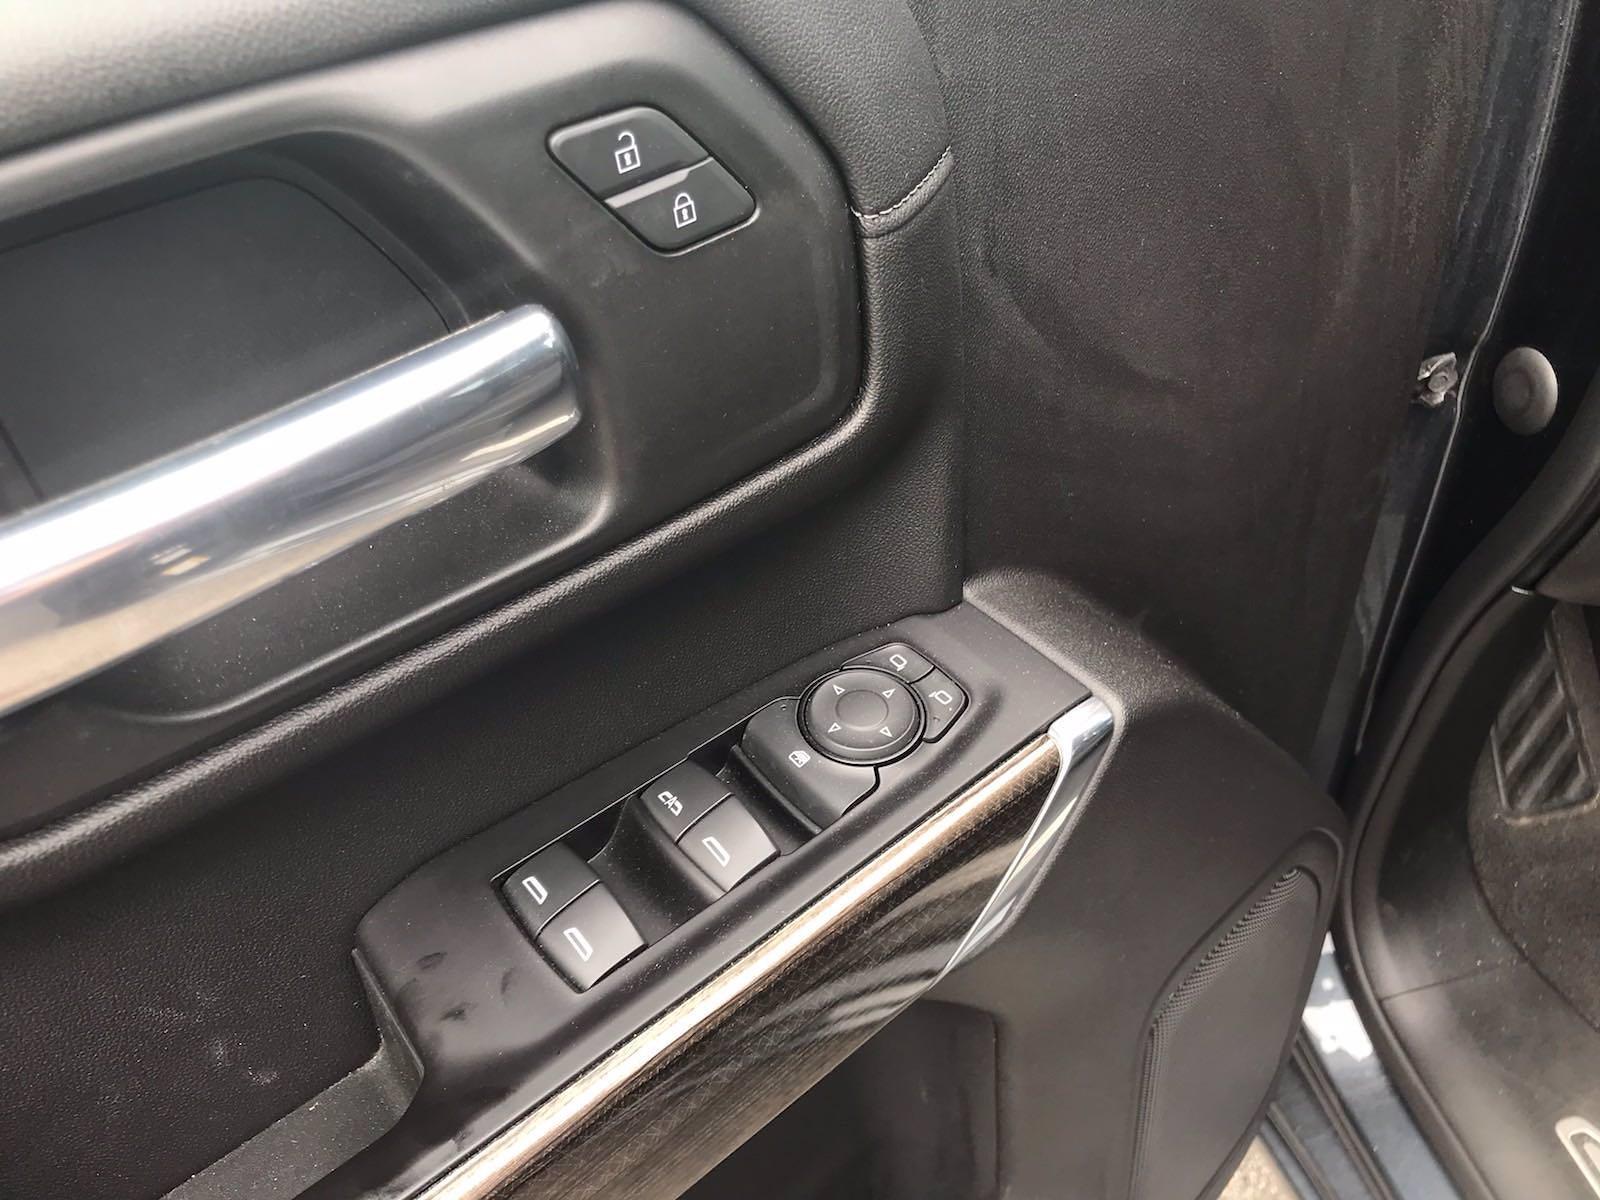 2020 Chevrolet Silverado 1500 Crew Cab 4x4, Pickup #16476PN - photo 21